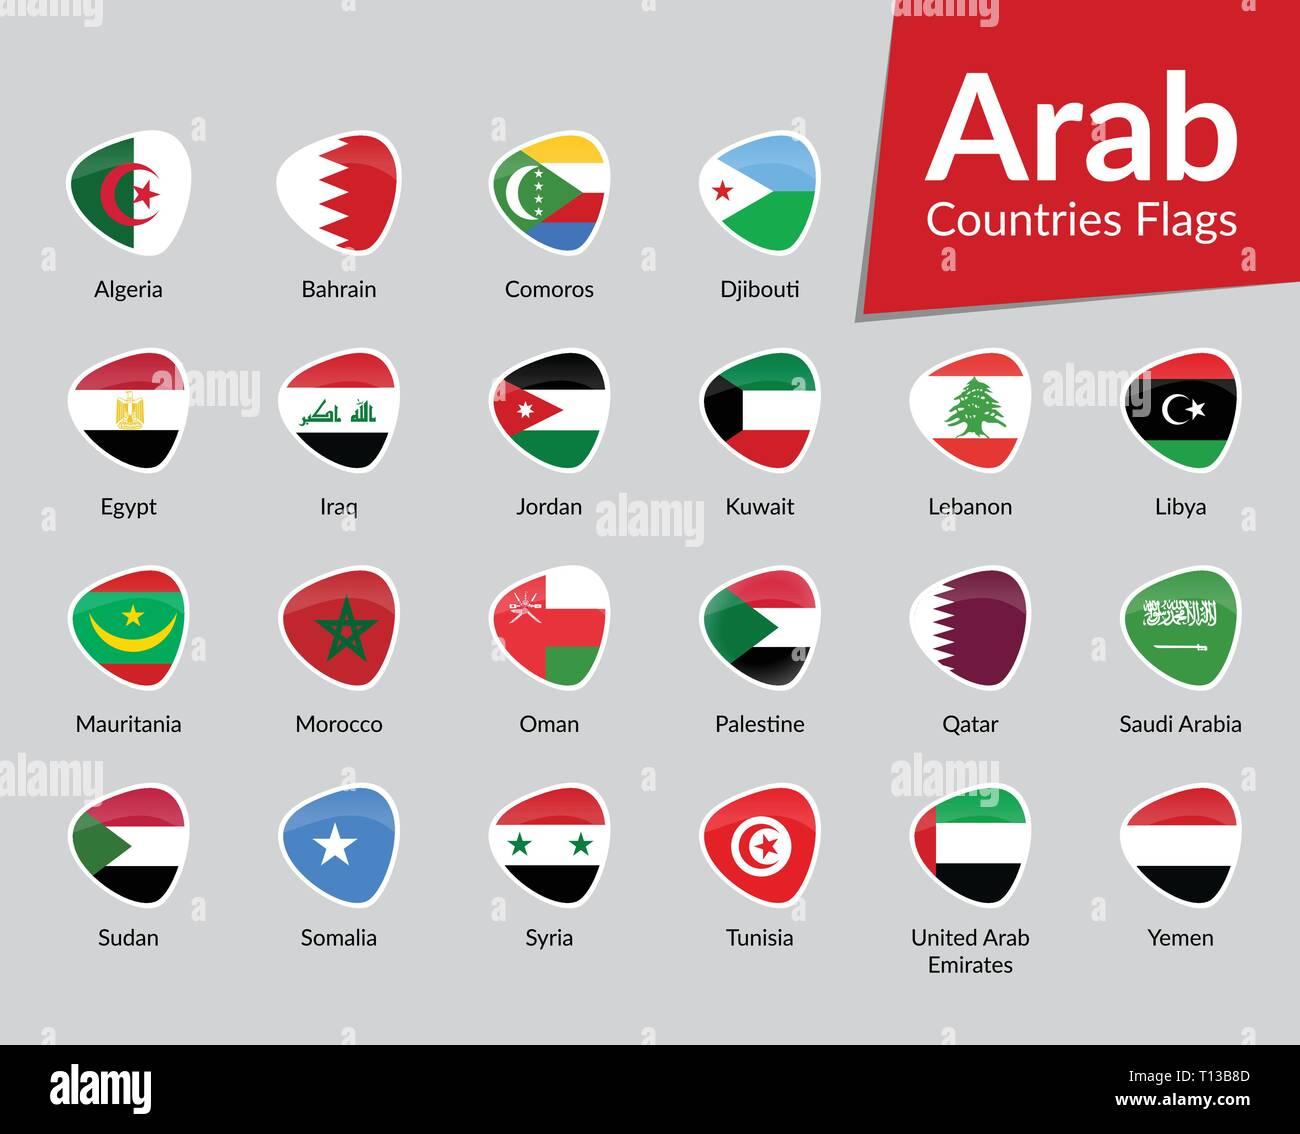 Arab Countries Flags vector icon collection - Stock Vector